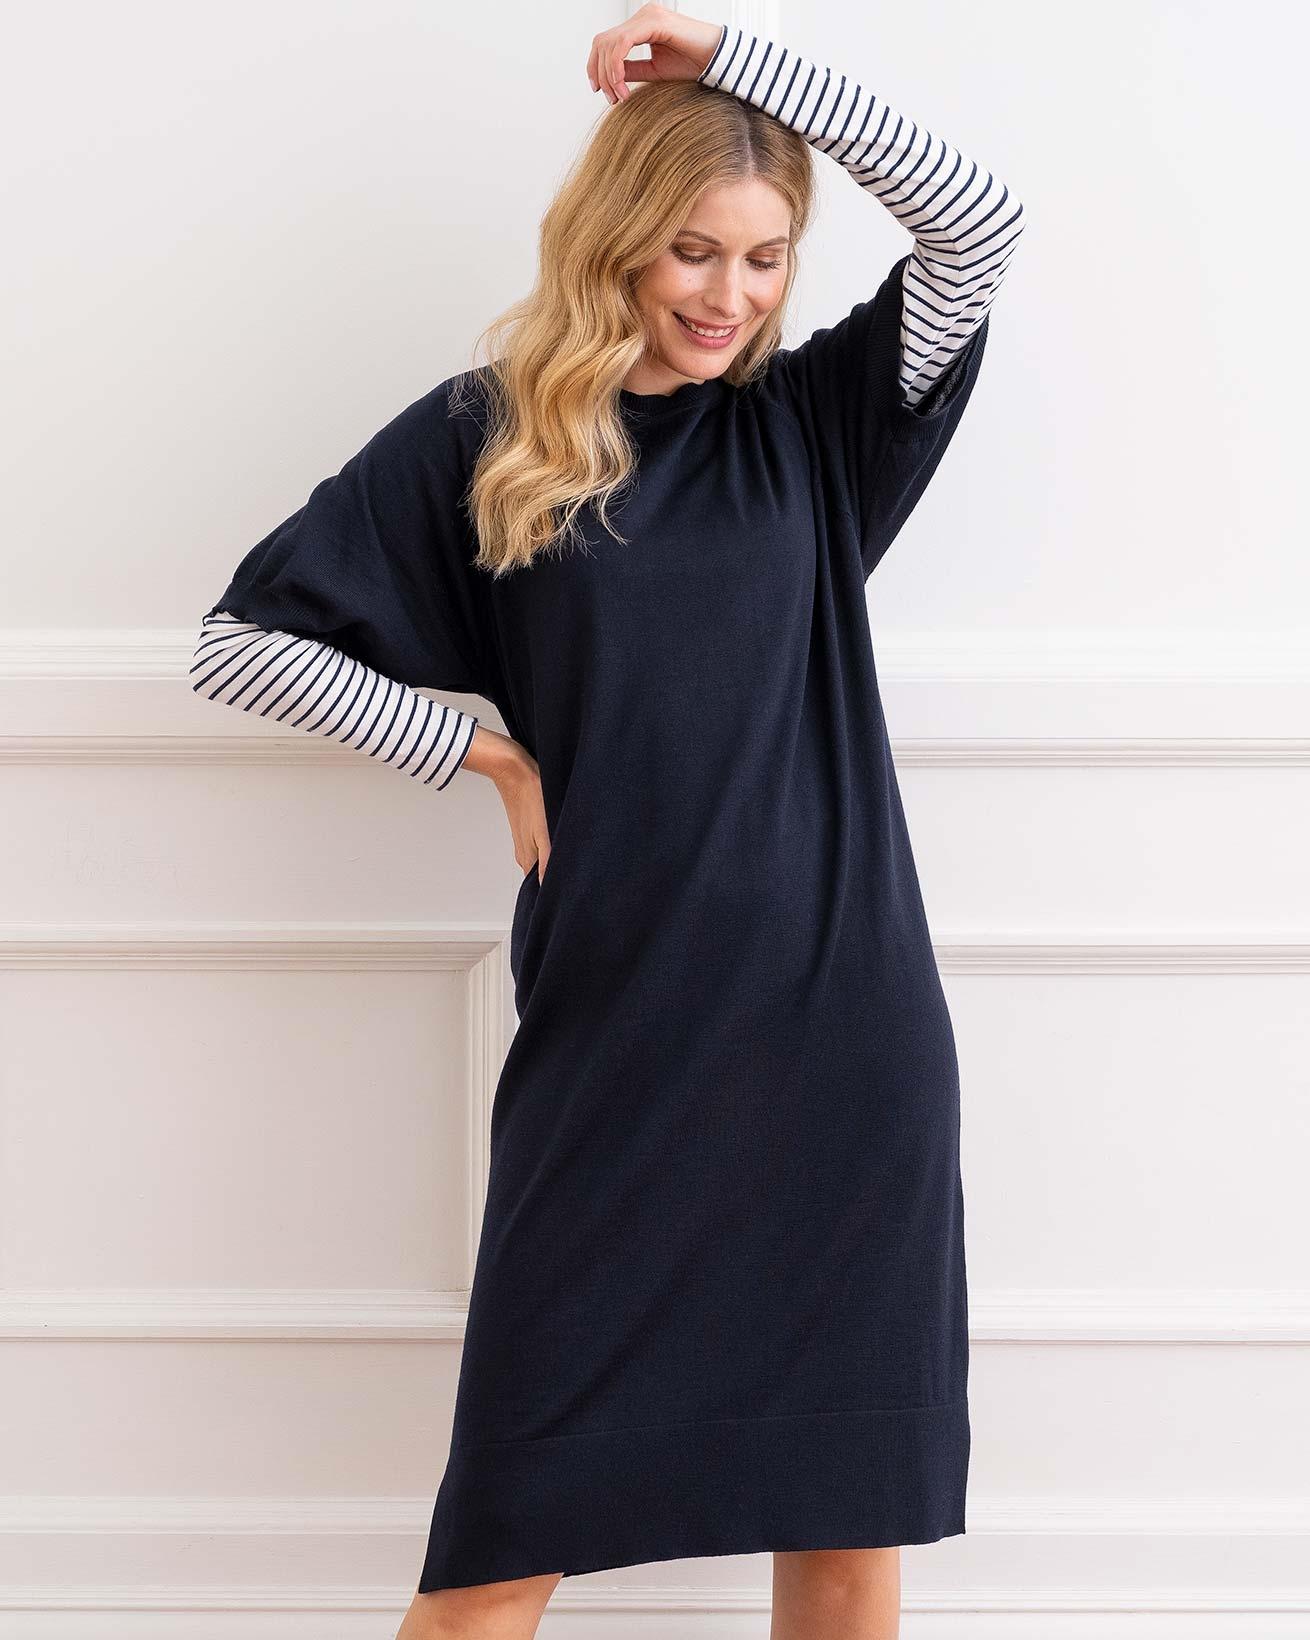 7812_merino_short_sleeve_midi_dress_dark_navy-32_web_crop.jpg